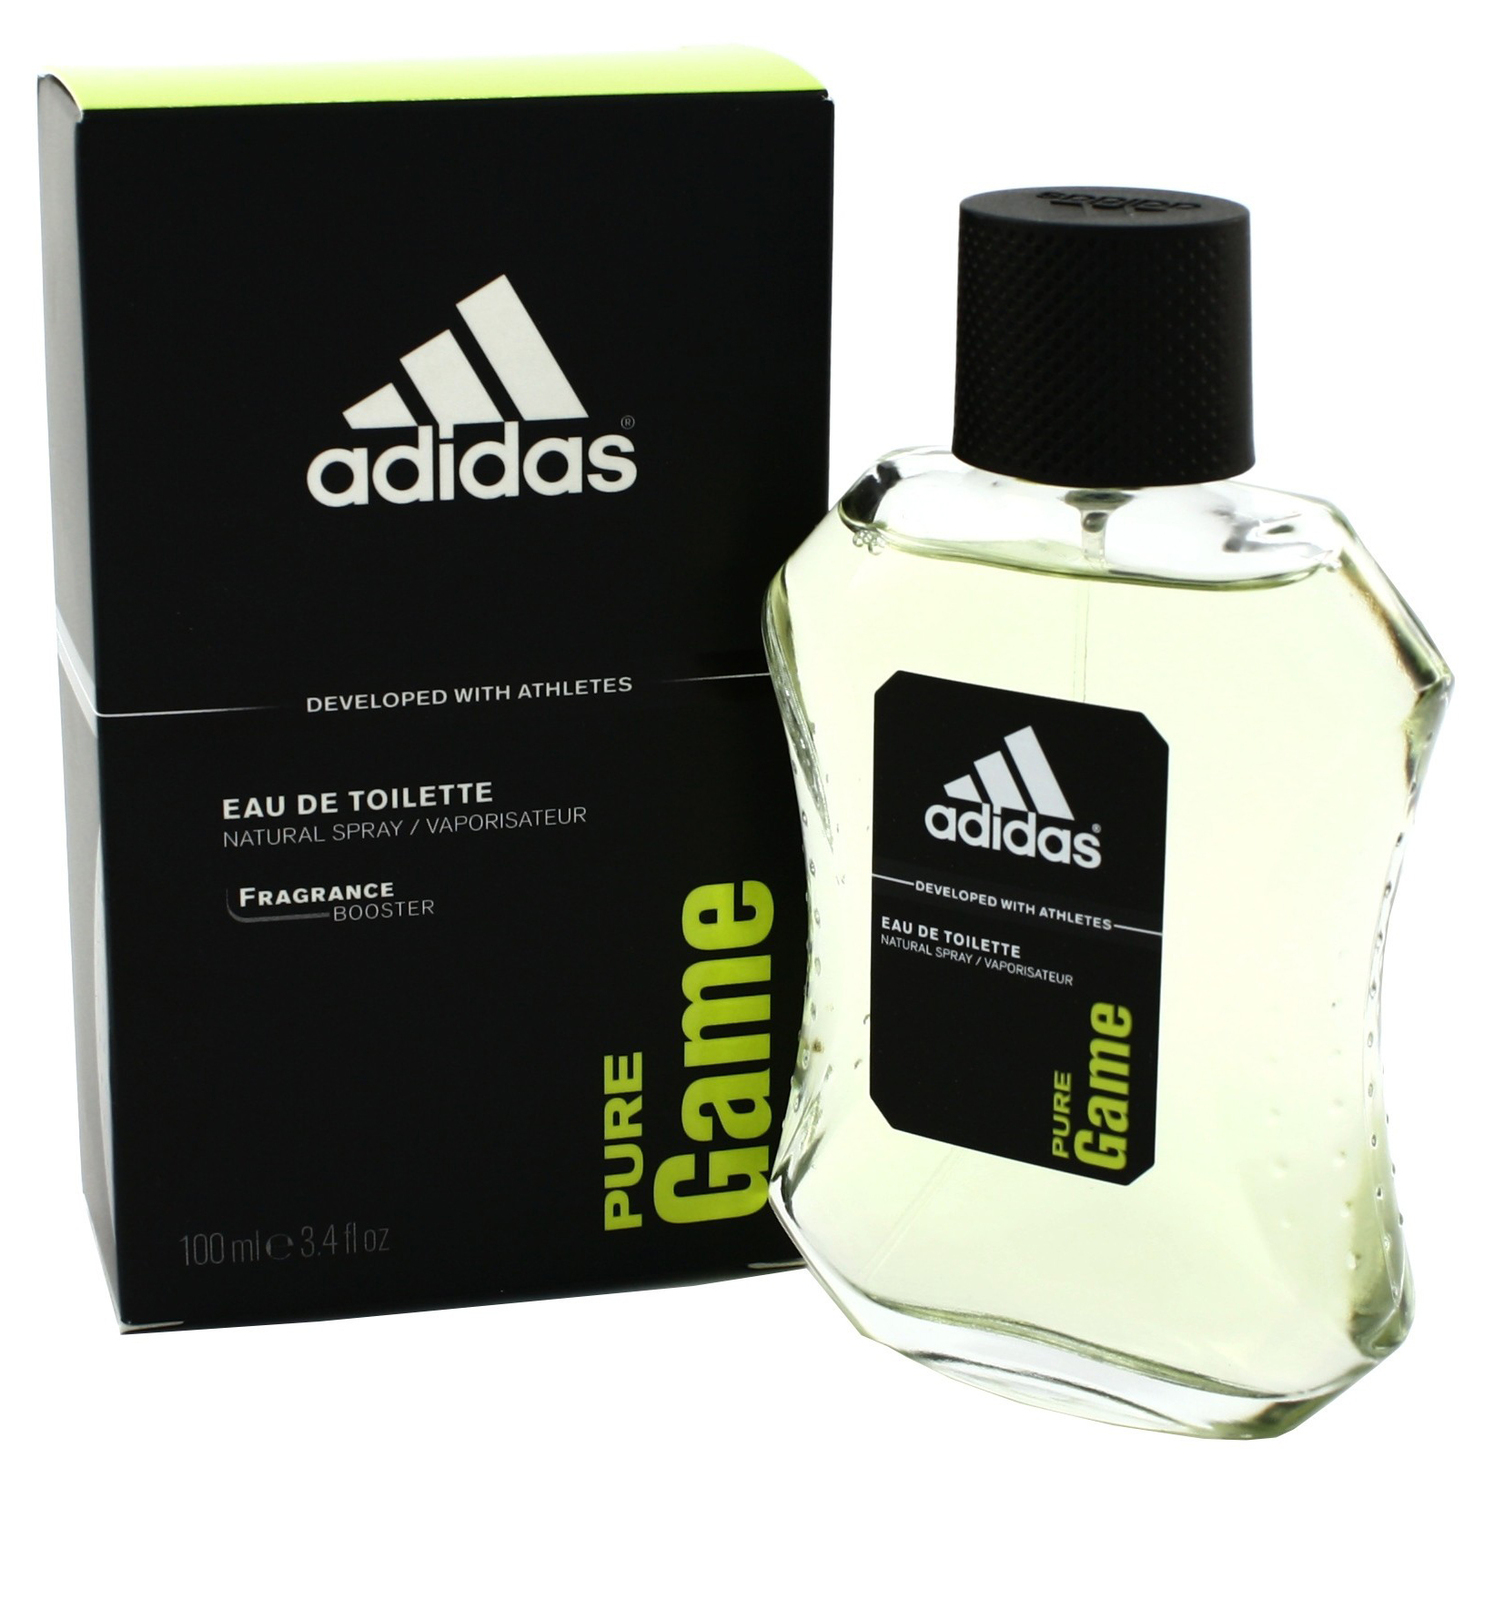 fórmula bloquear Fonética  Buy Adidas Pure Game at Mighty Ape NZ